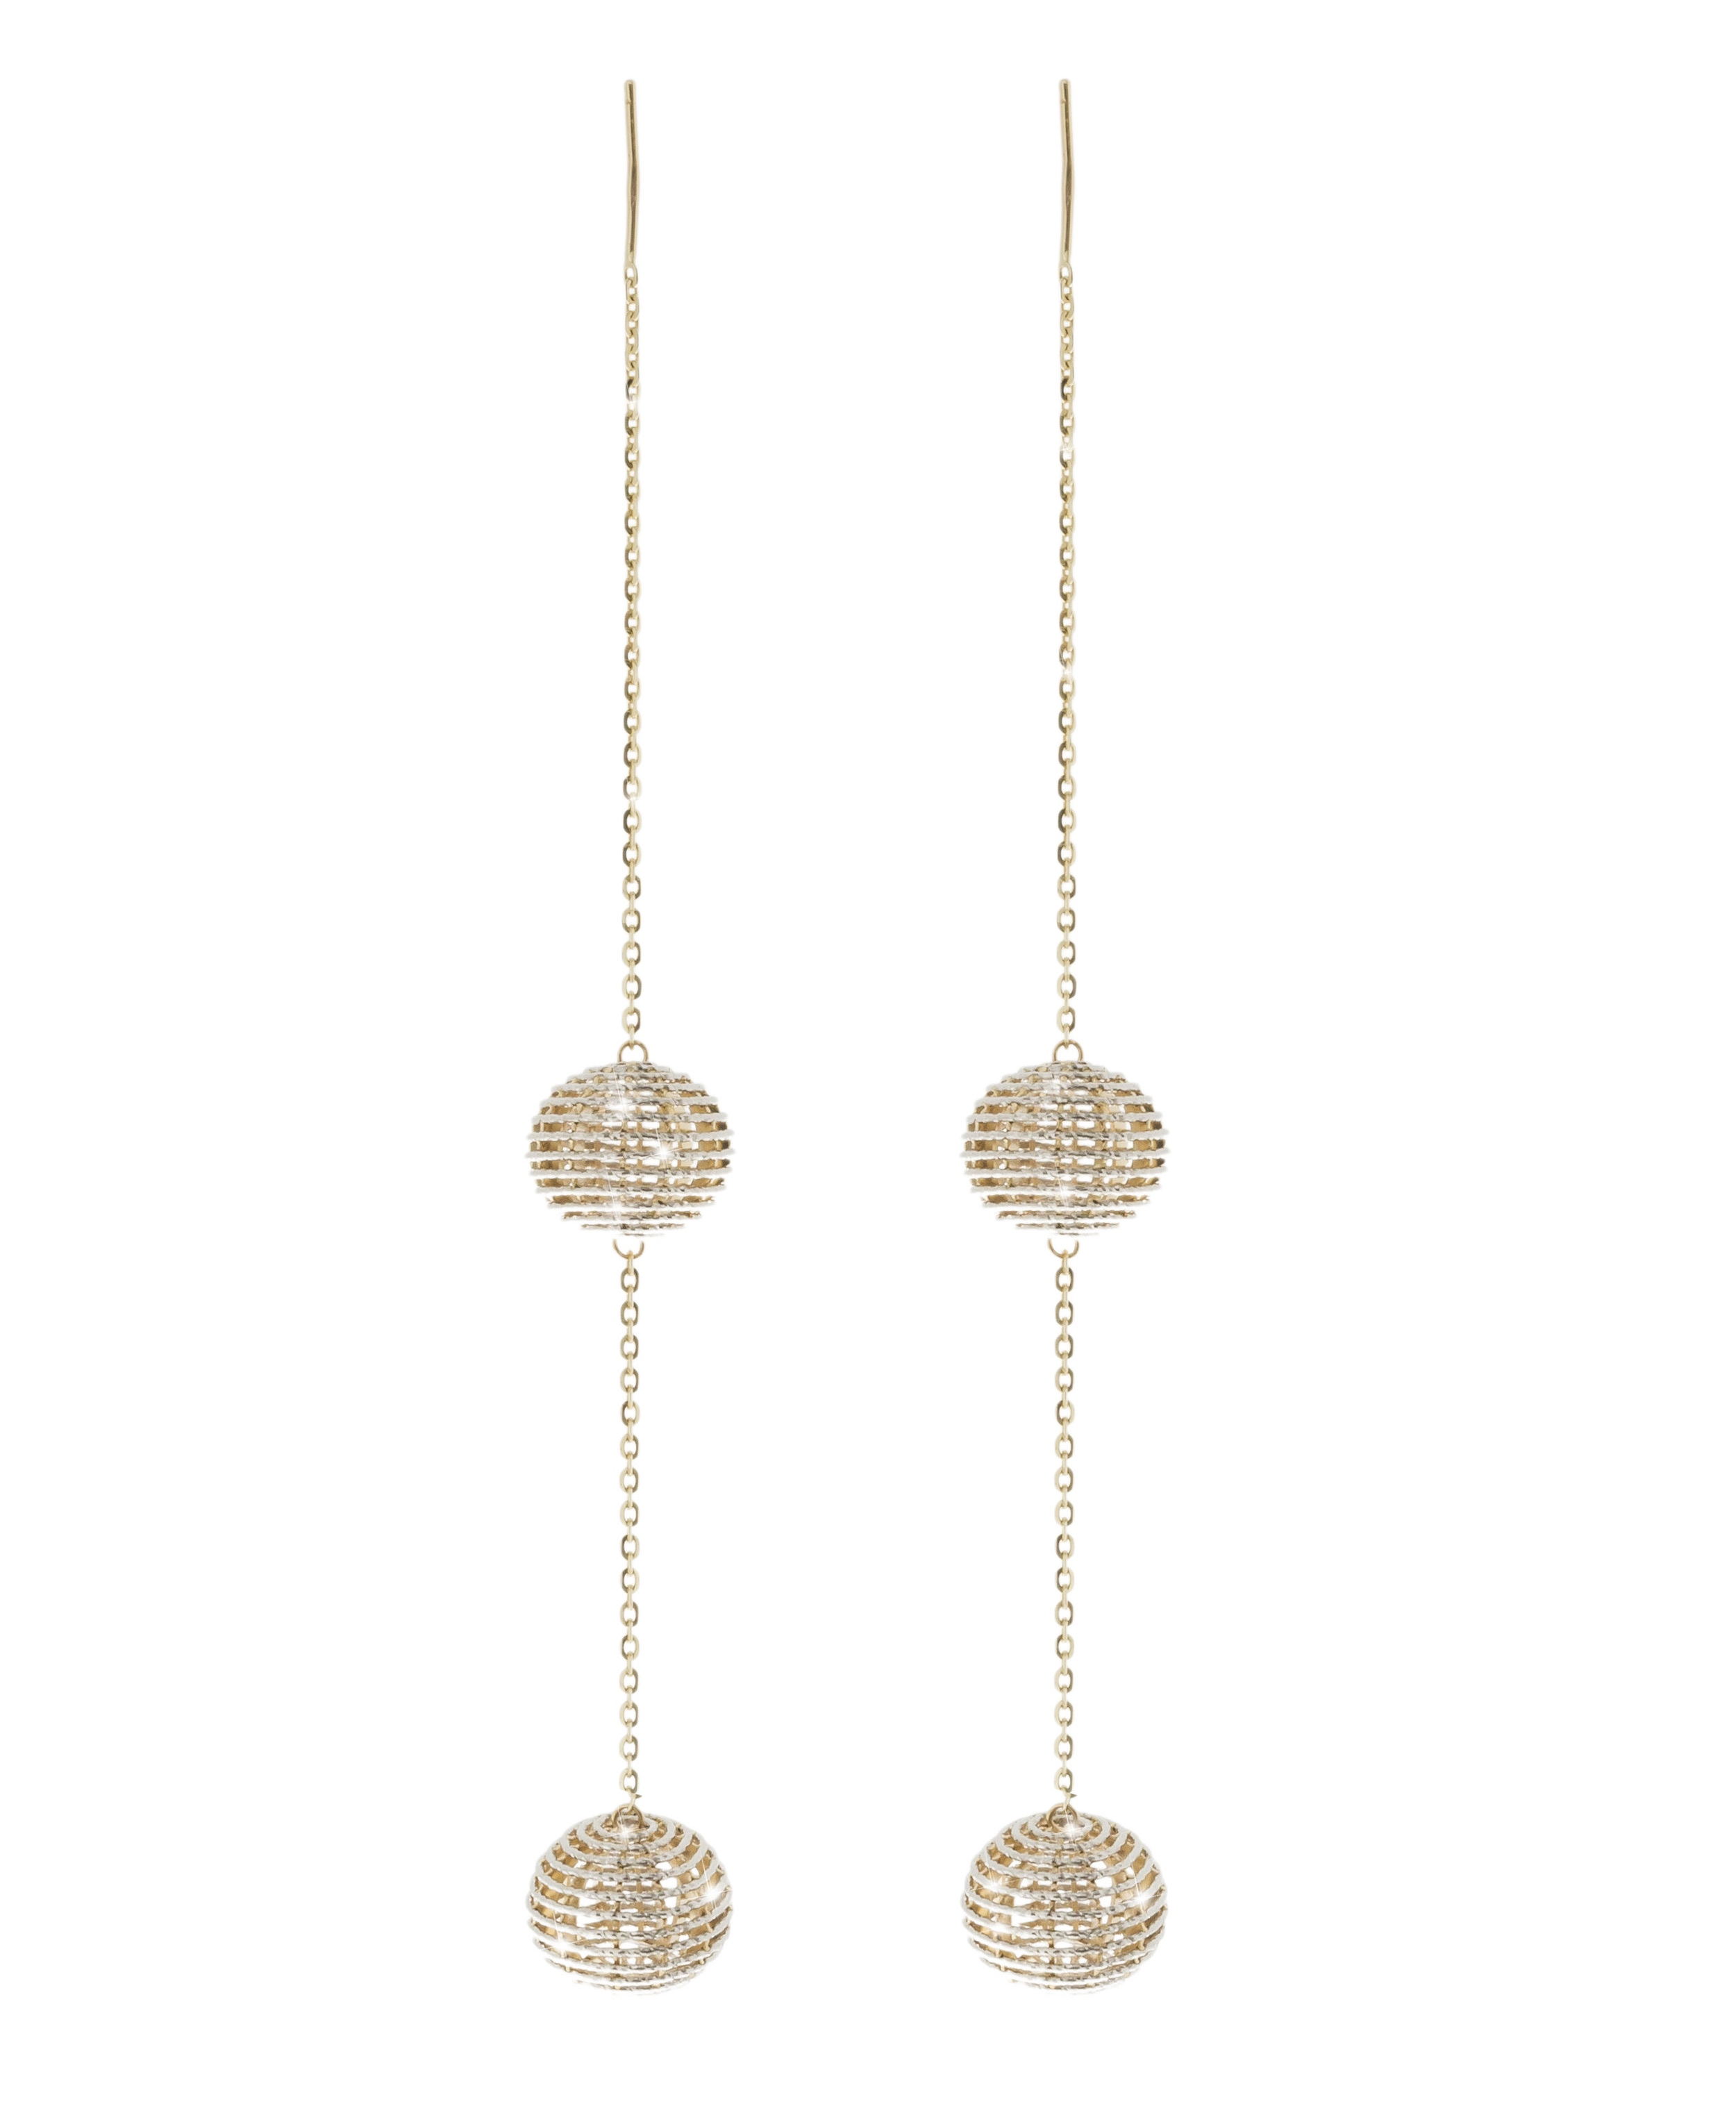 Giuliana Mancinelli Bonafaccia gold Fine Jewelry Noesi double Earrings.jpg